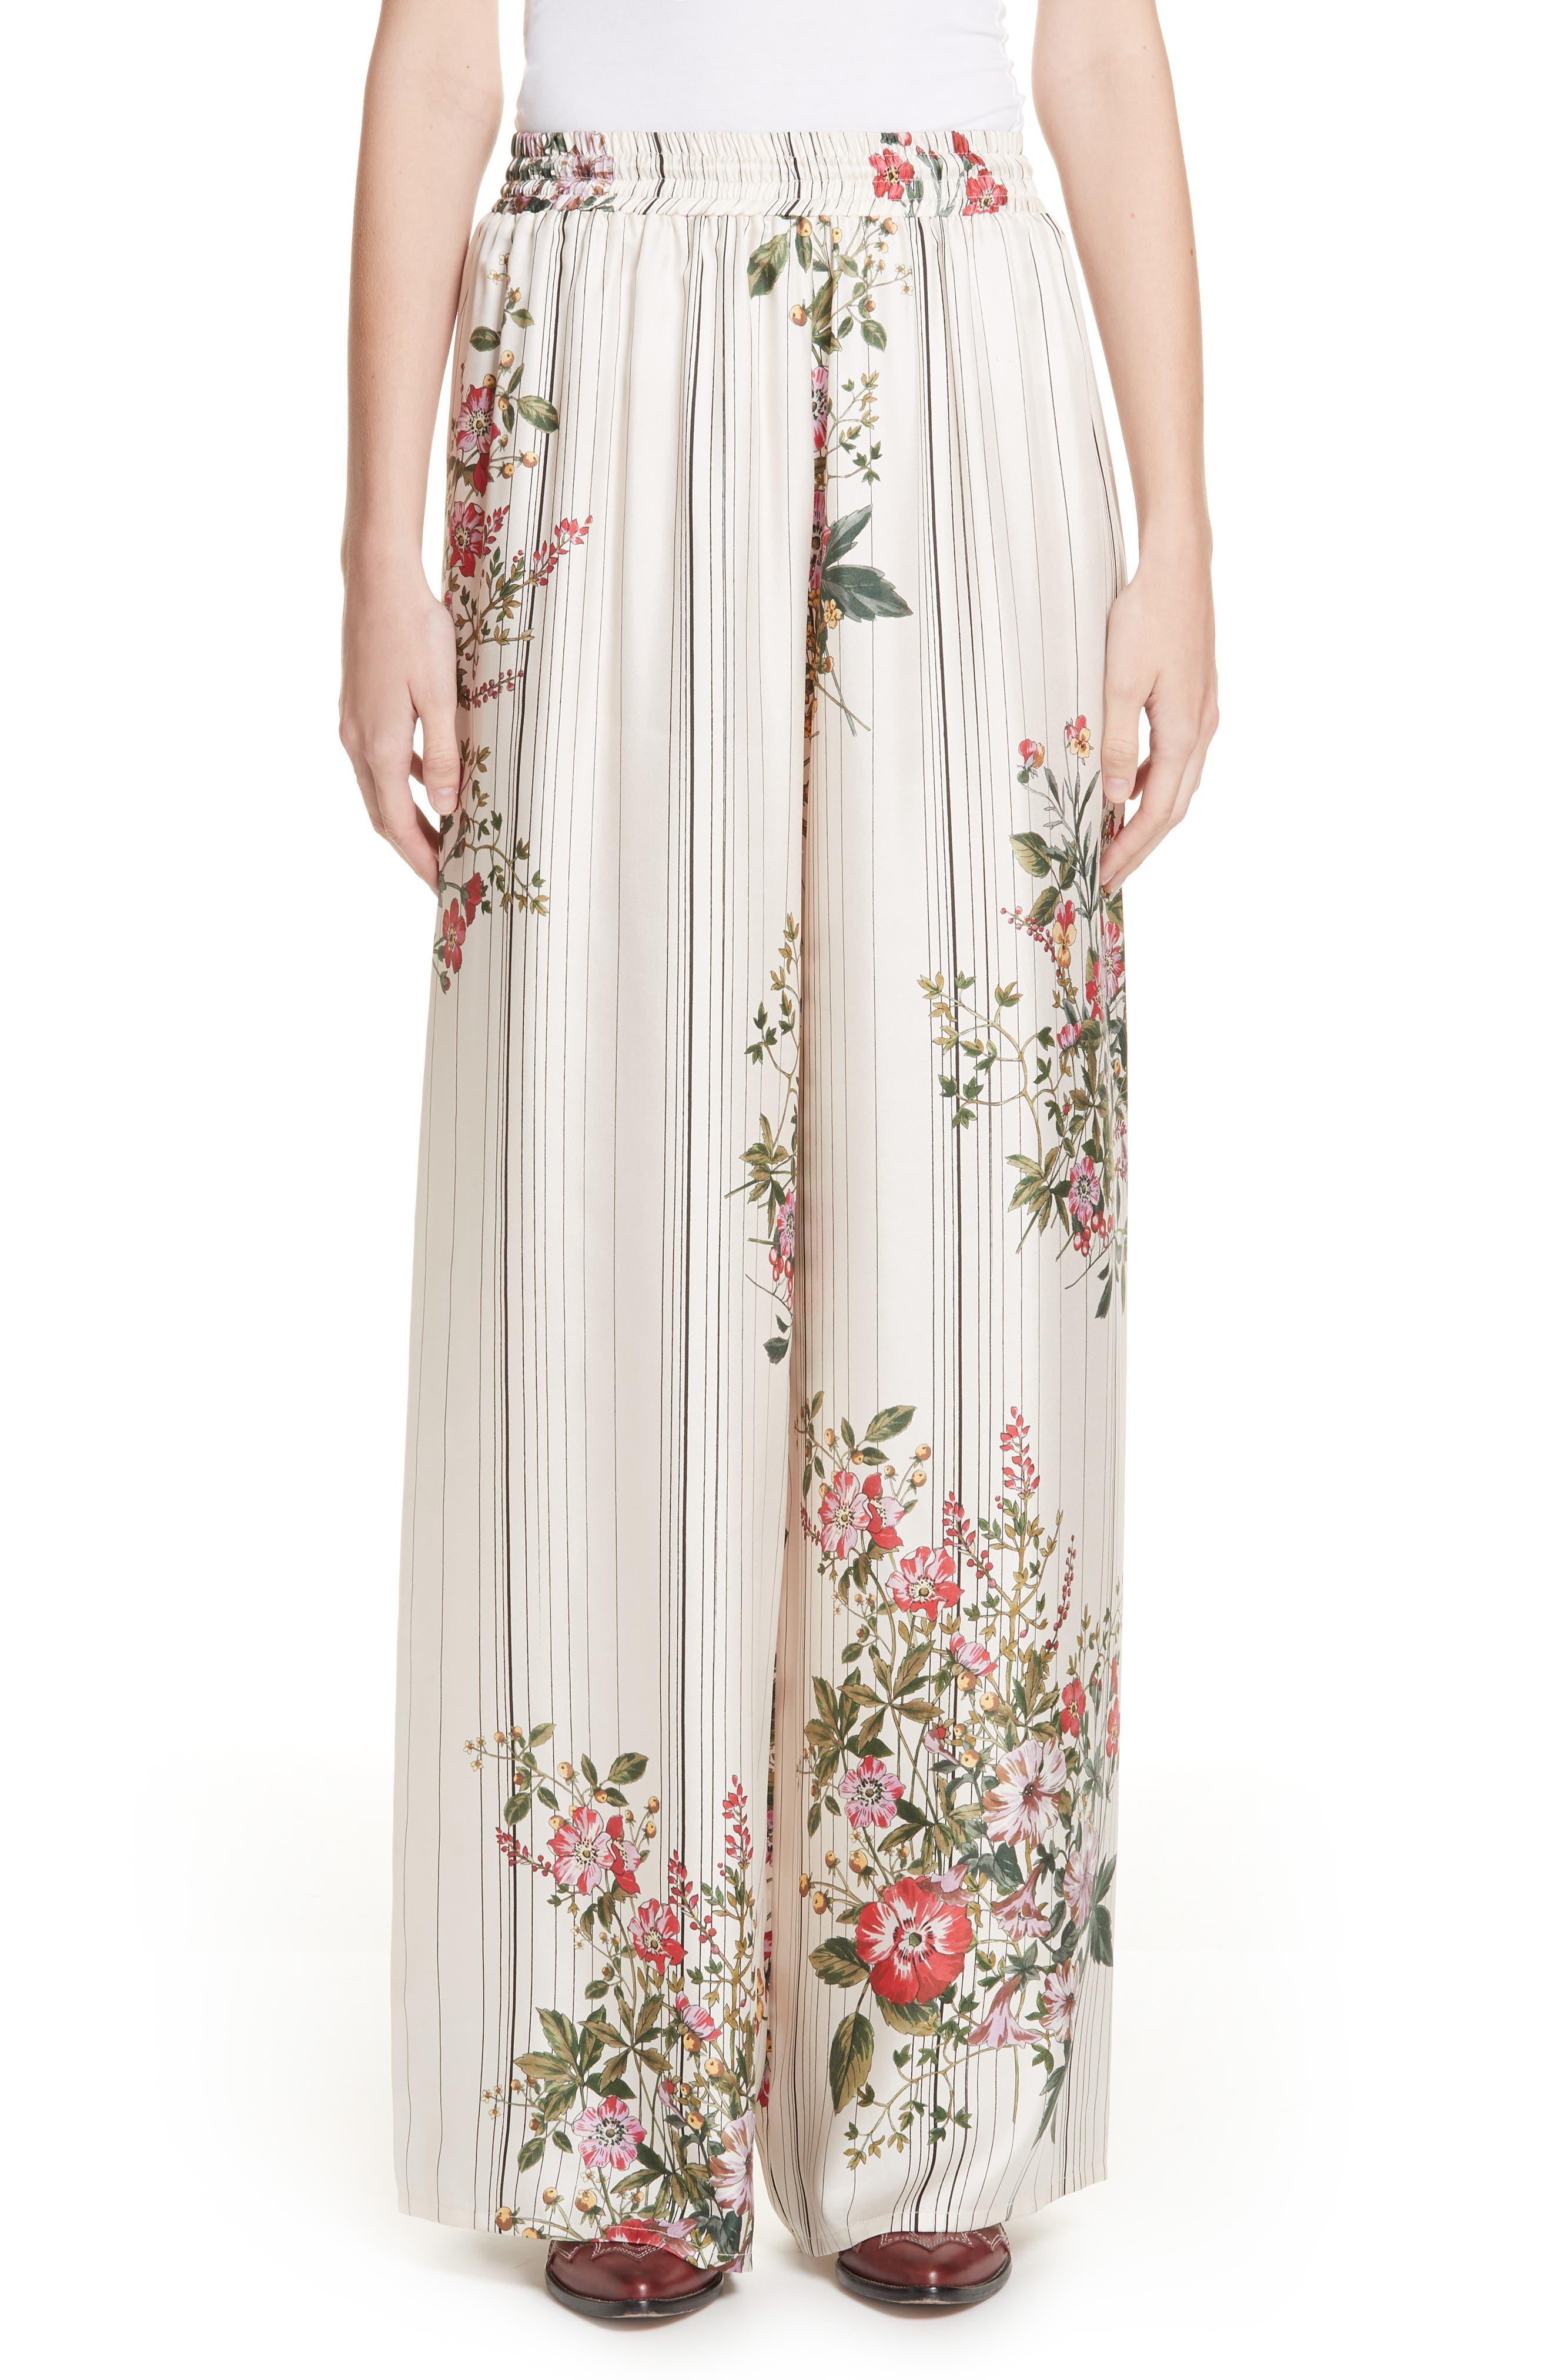 ROSEANNA Conner Floral & Stripe Wide Leg Silk Pants in Multi Ivoire